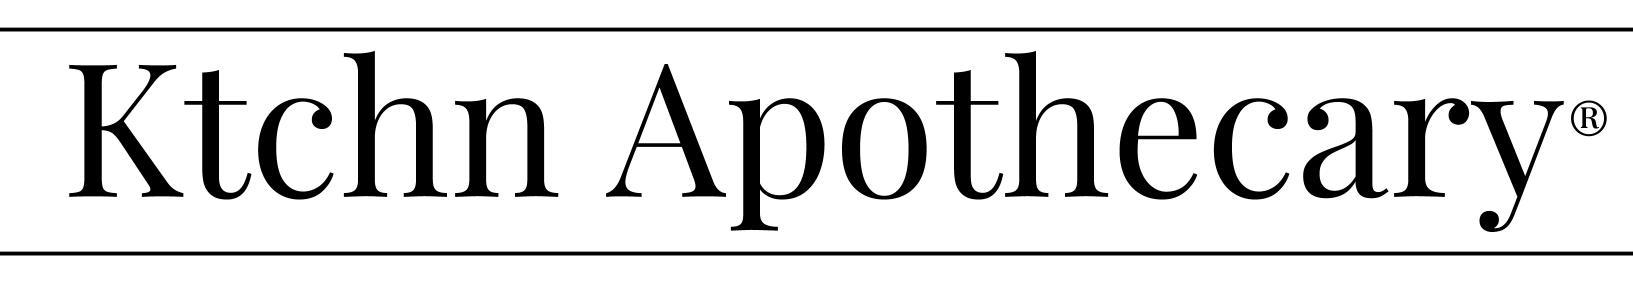 Ktchn Apothecary Logo.jpg